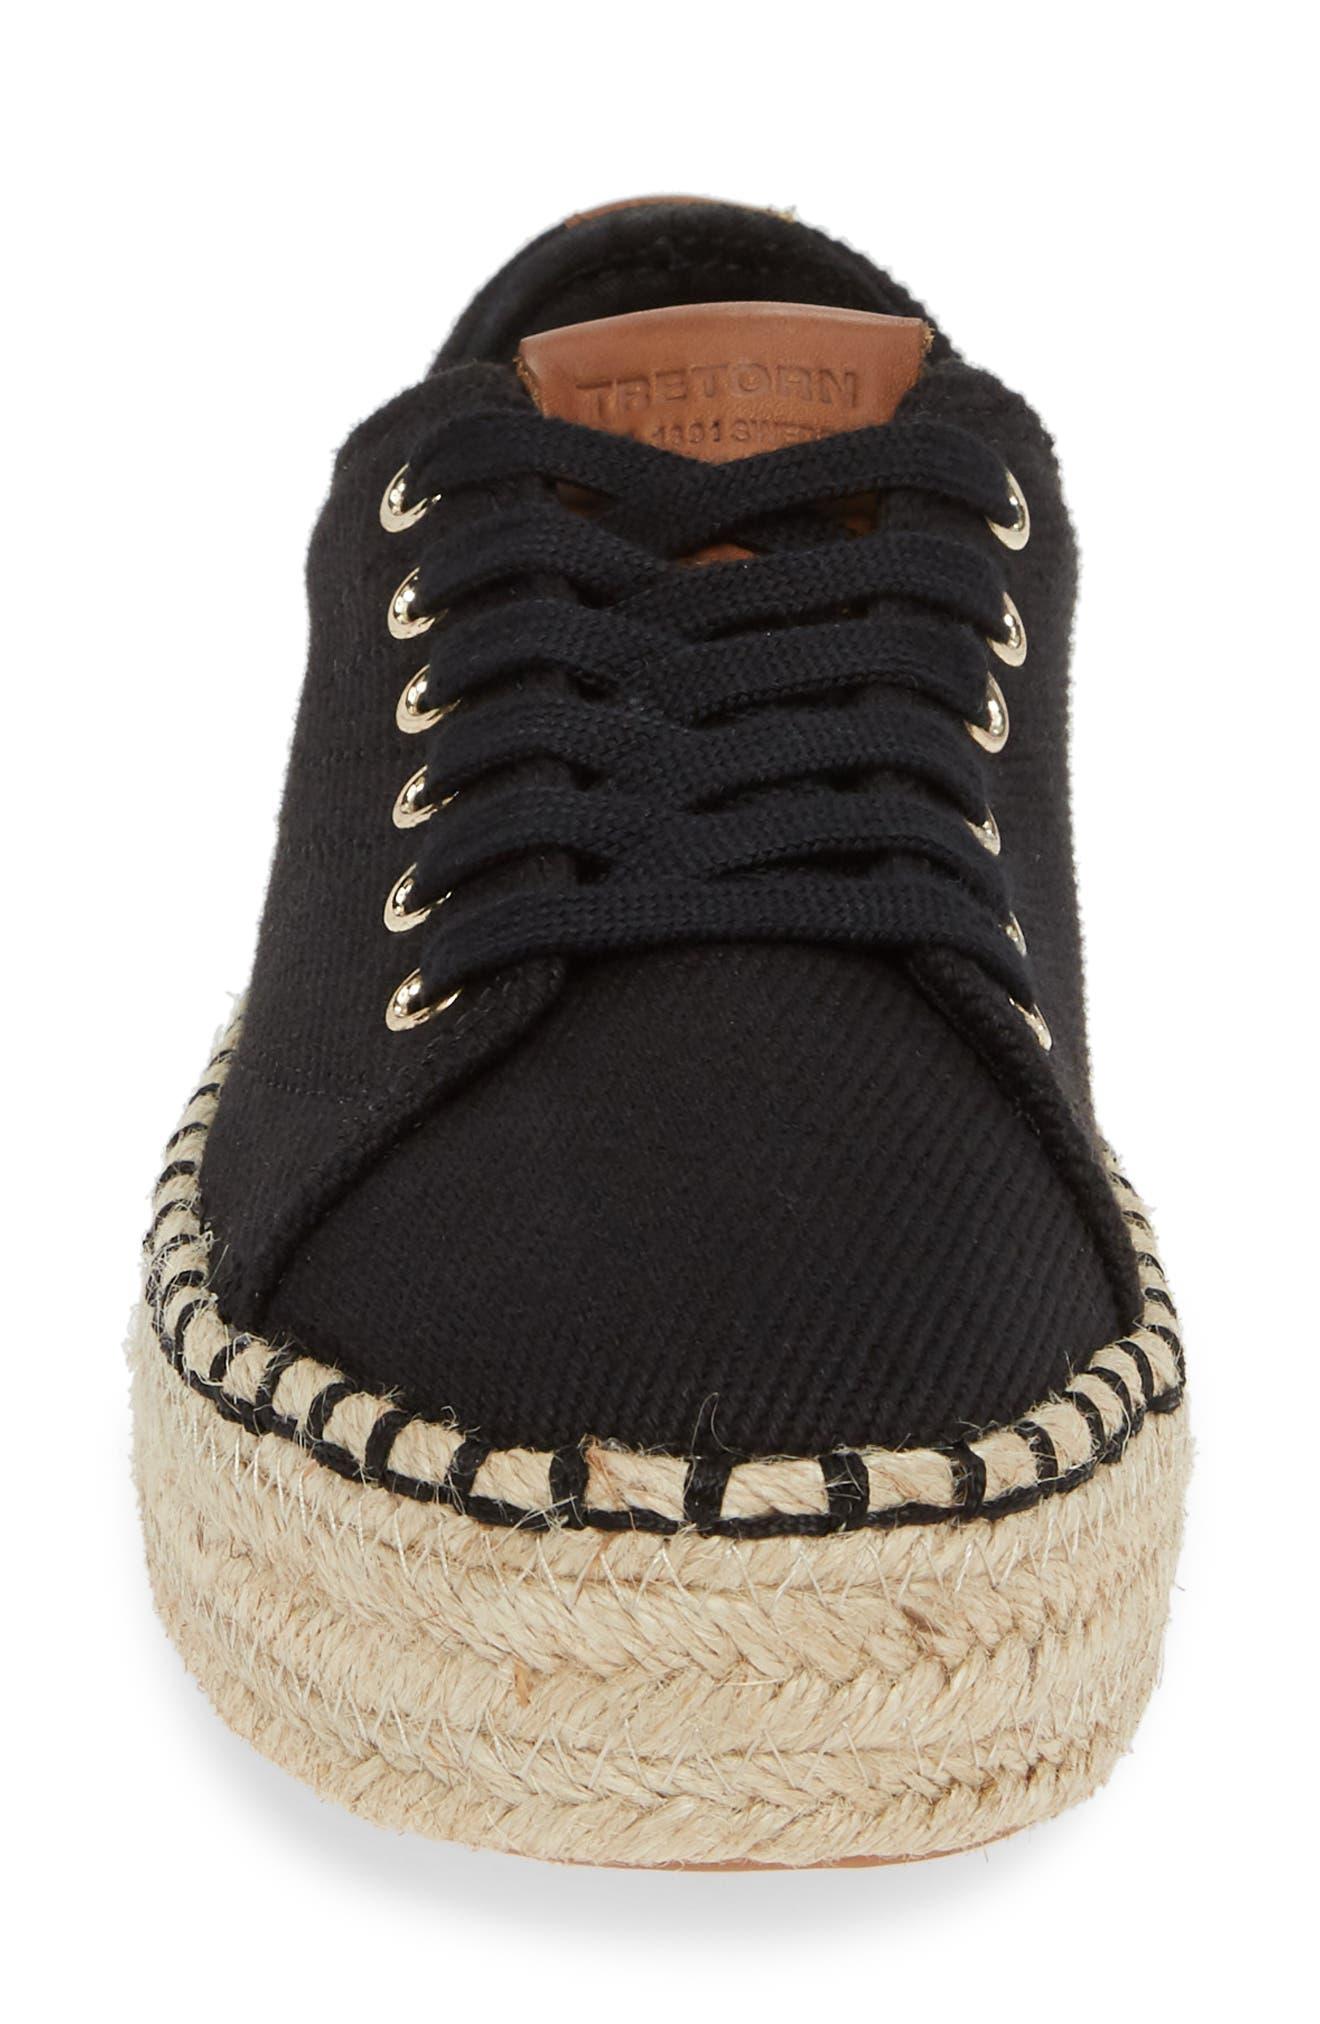 Platform Espadrille Sneaker,                             Alternate thumbnail 4, color,                             BLACK/ KONA TAN FABRIC